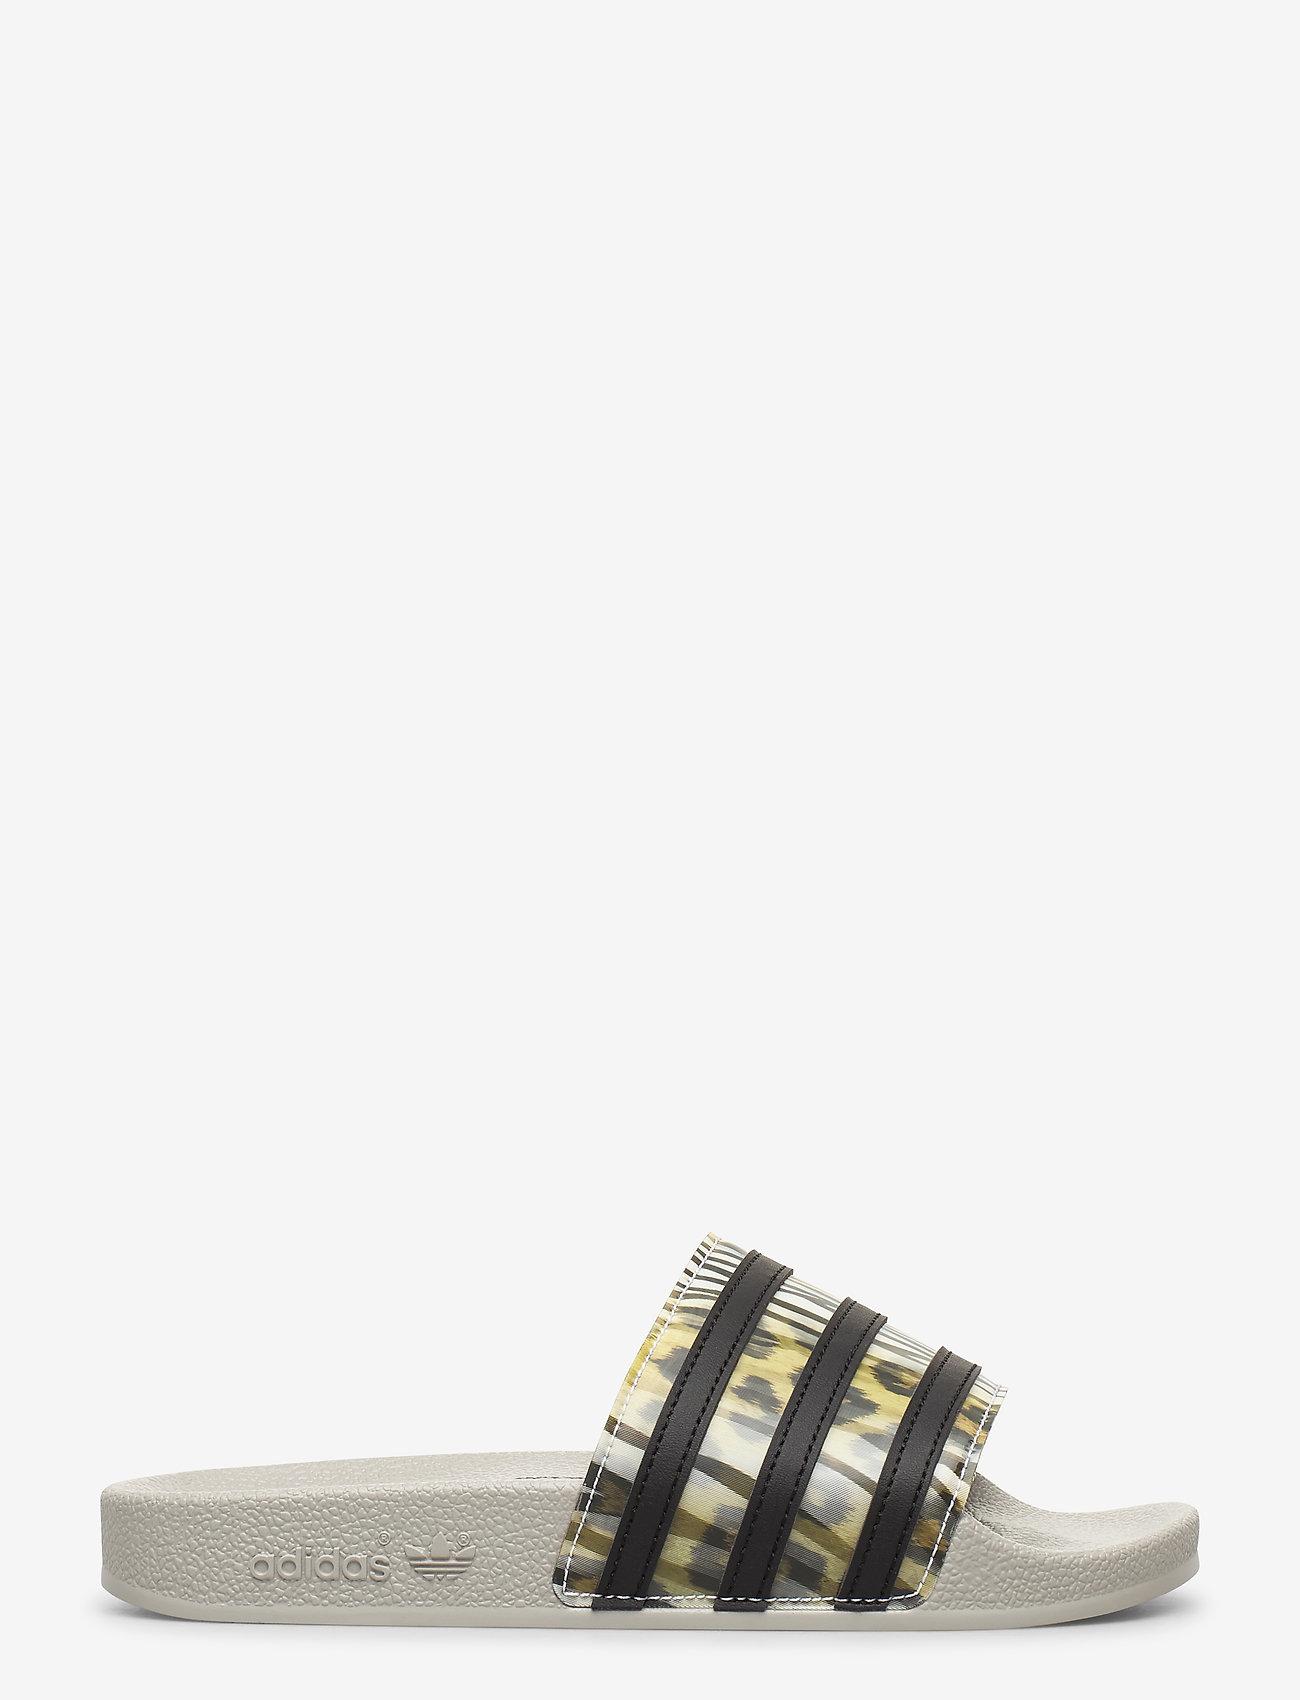 adidas Originals - ADILETTE W - sneakers - cblack/cblack/metgry - 1